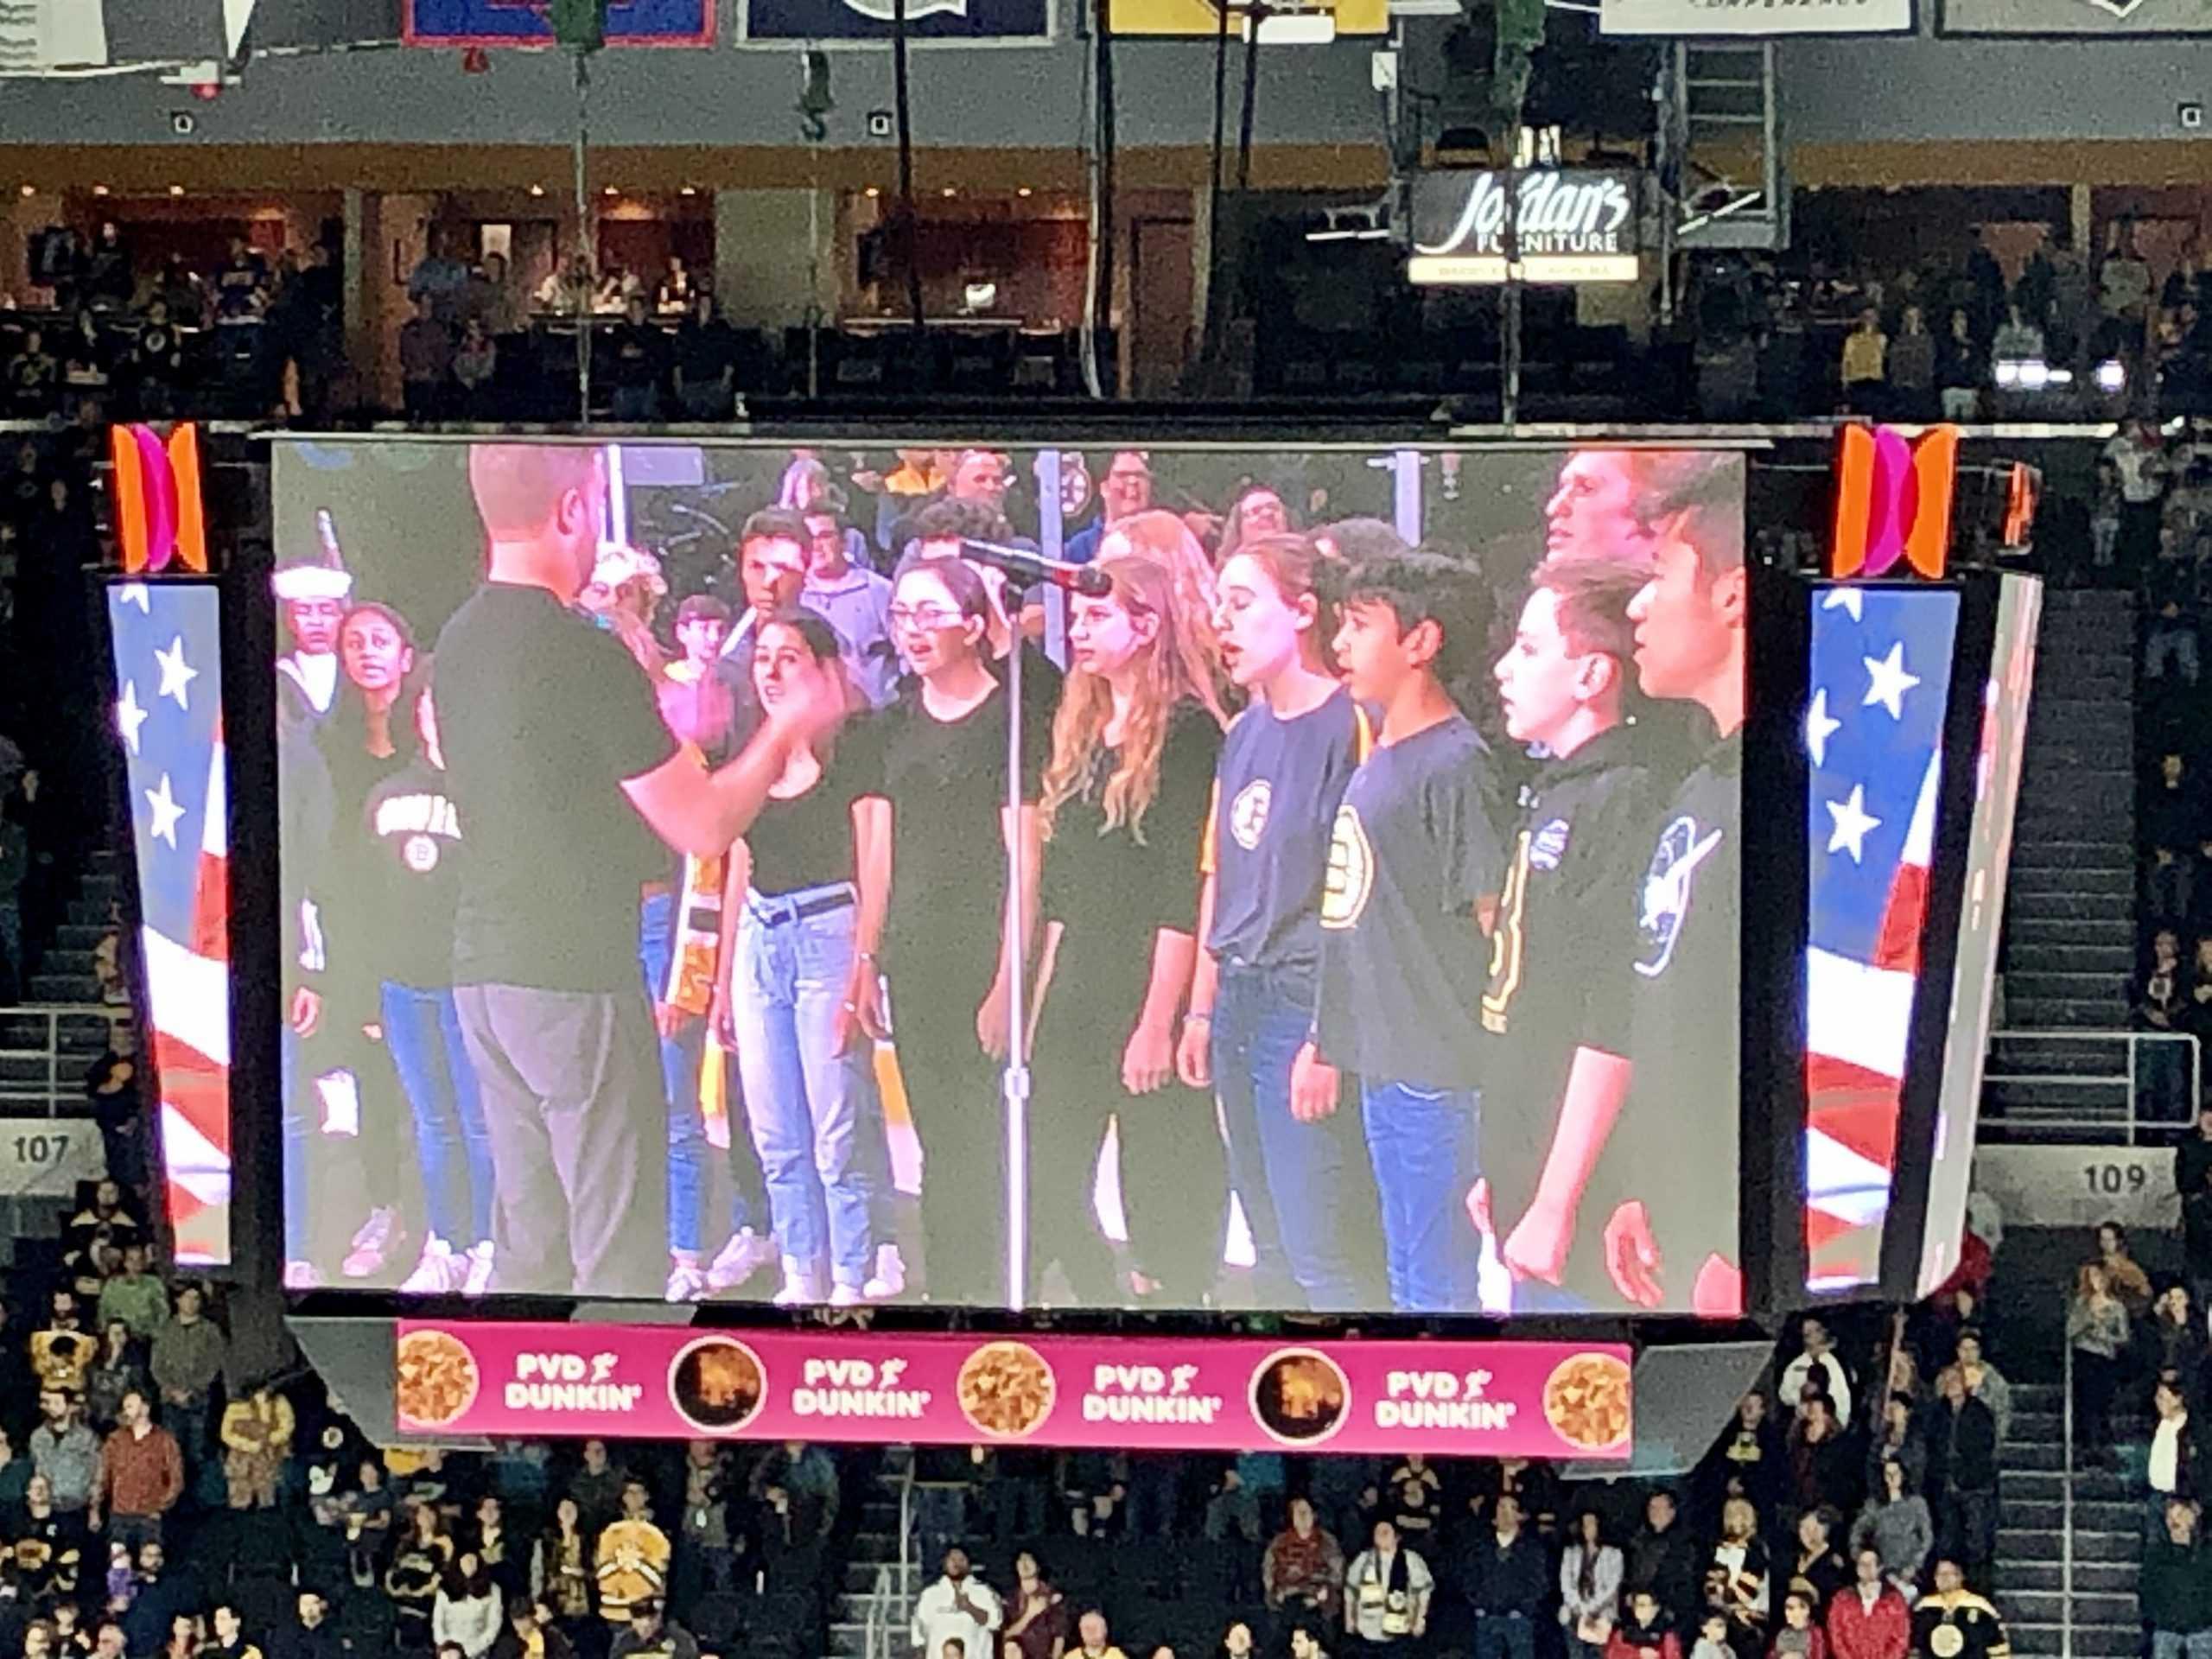 The+choir+sang+America%2C+the+Beautiful.+